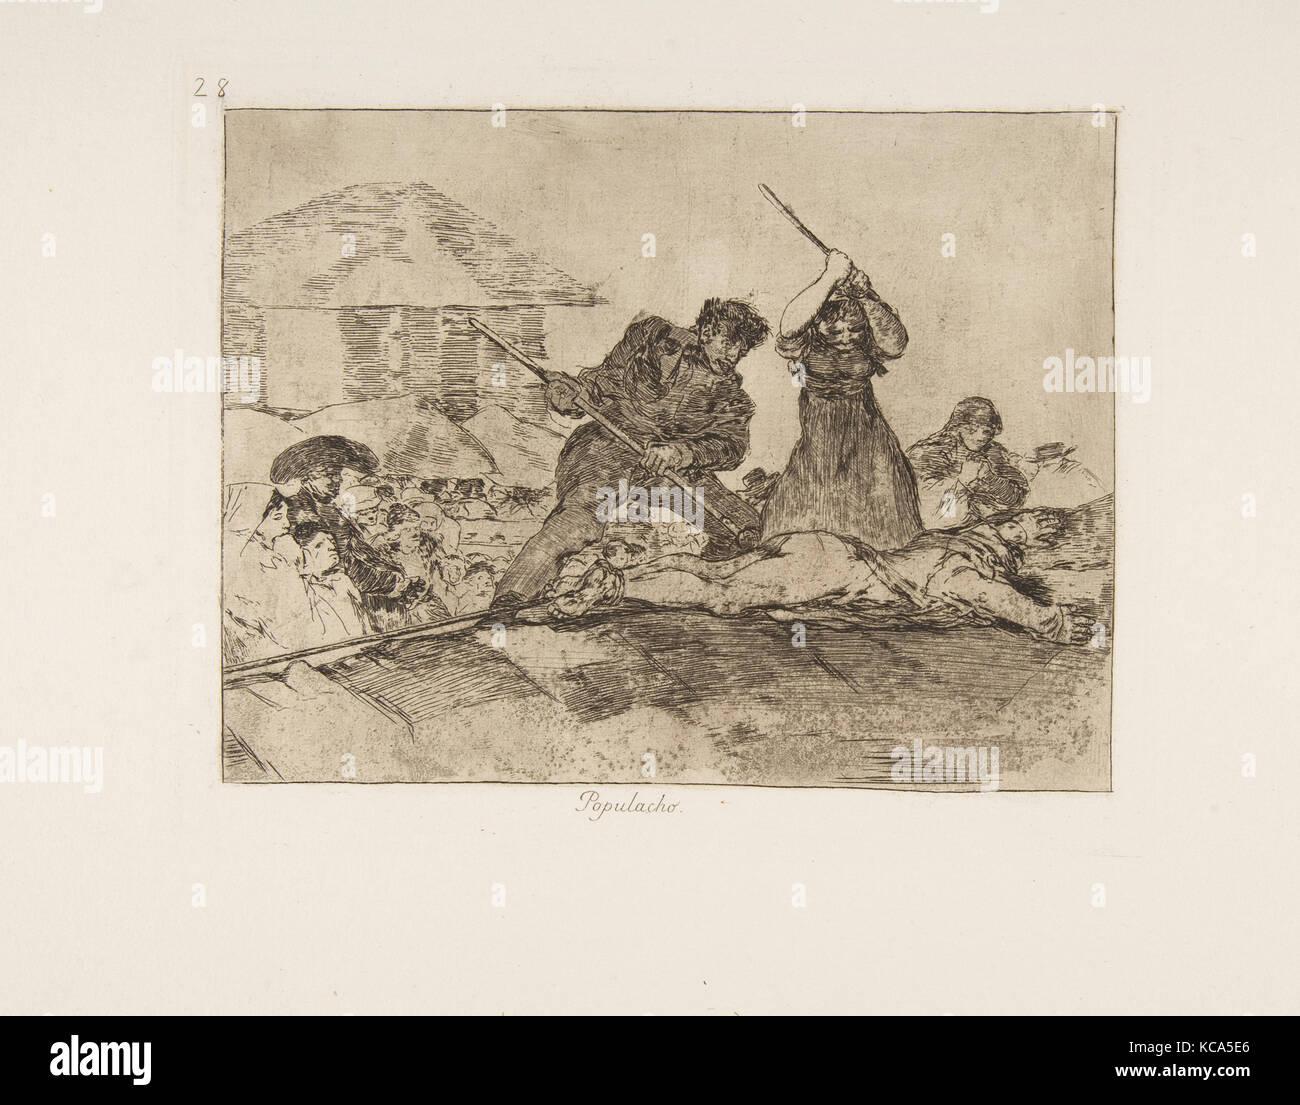 goyas disasters of war